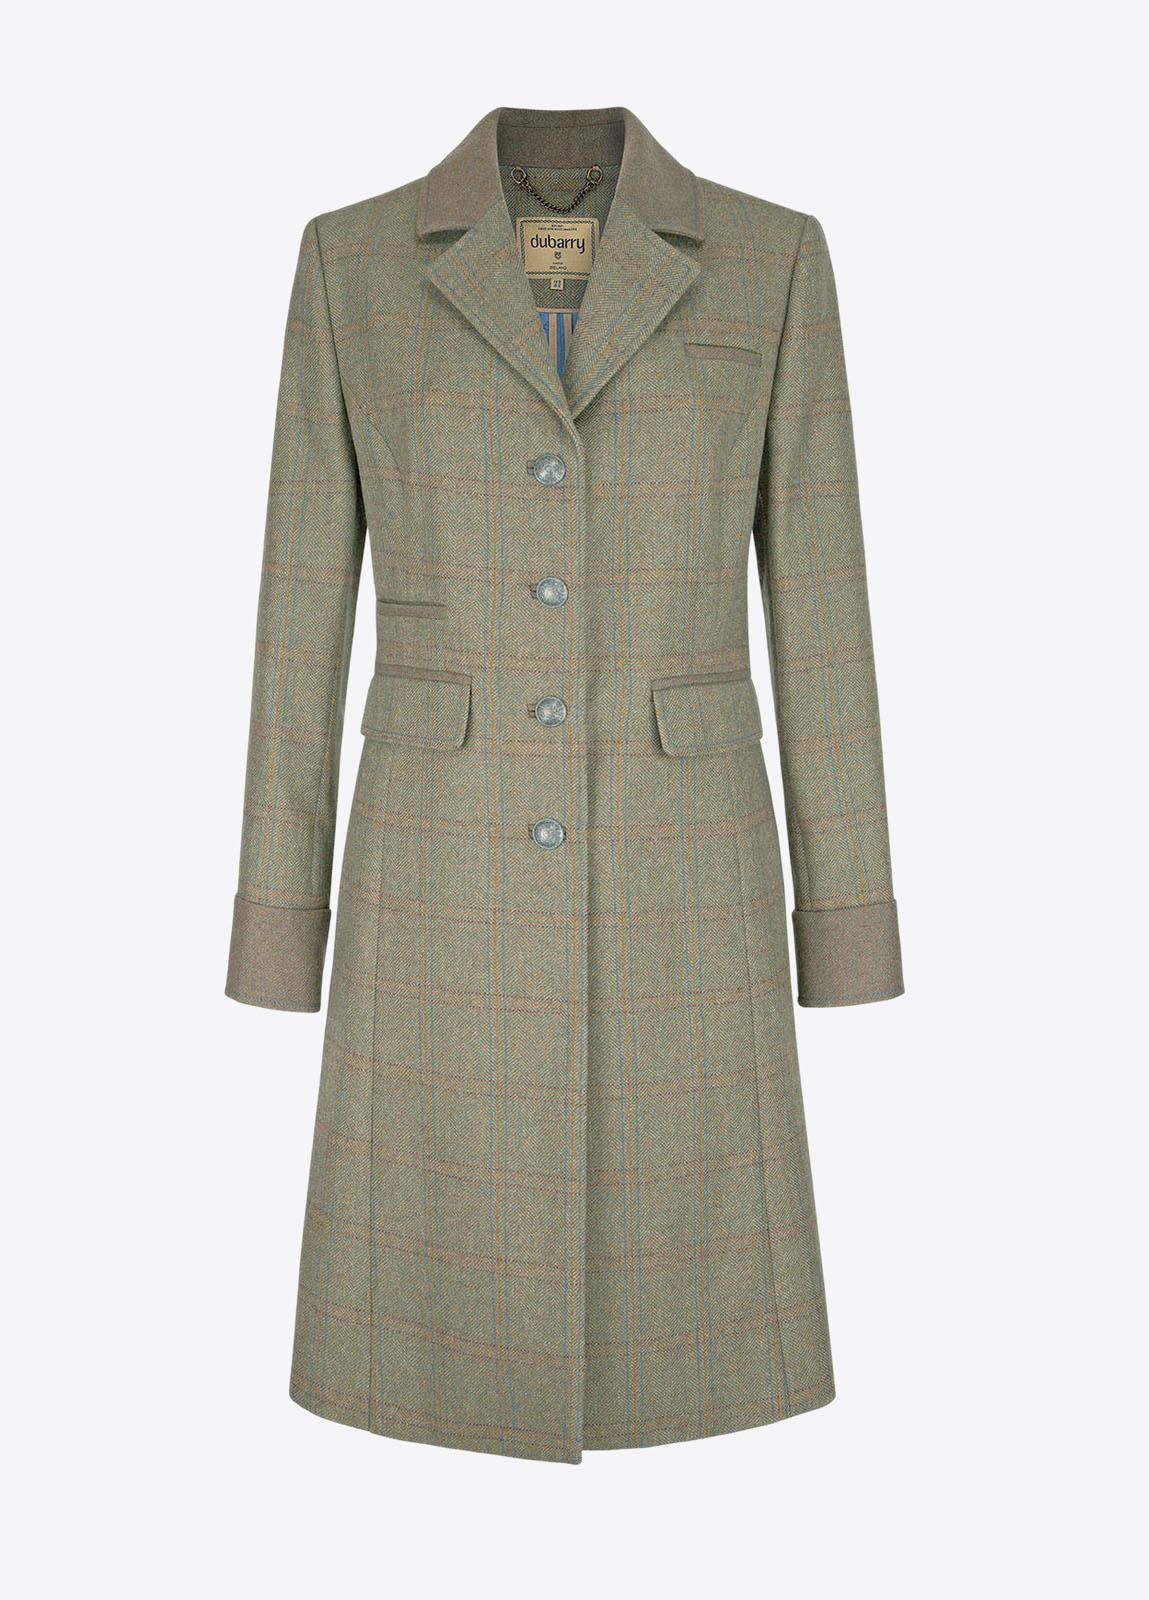 Blackthorn Tweed Jacket - Connacht Acorn